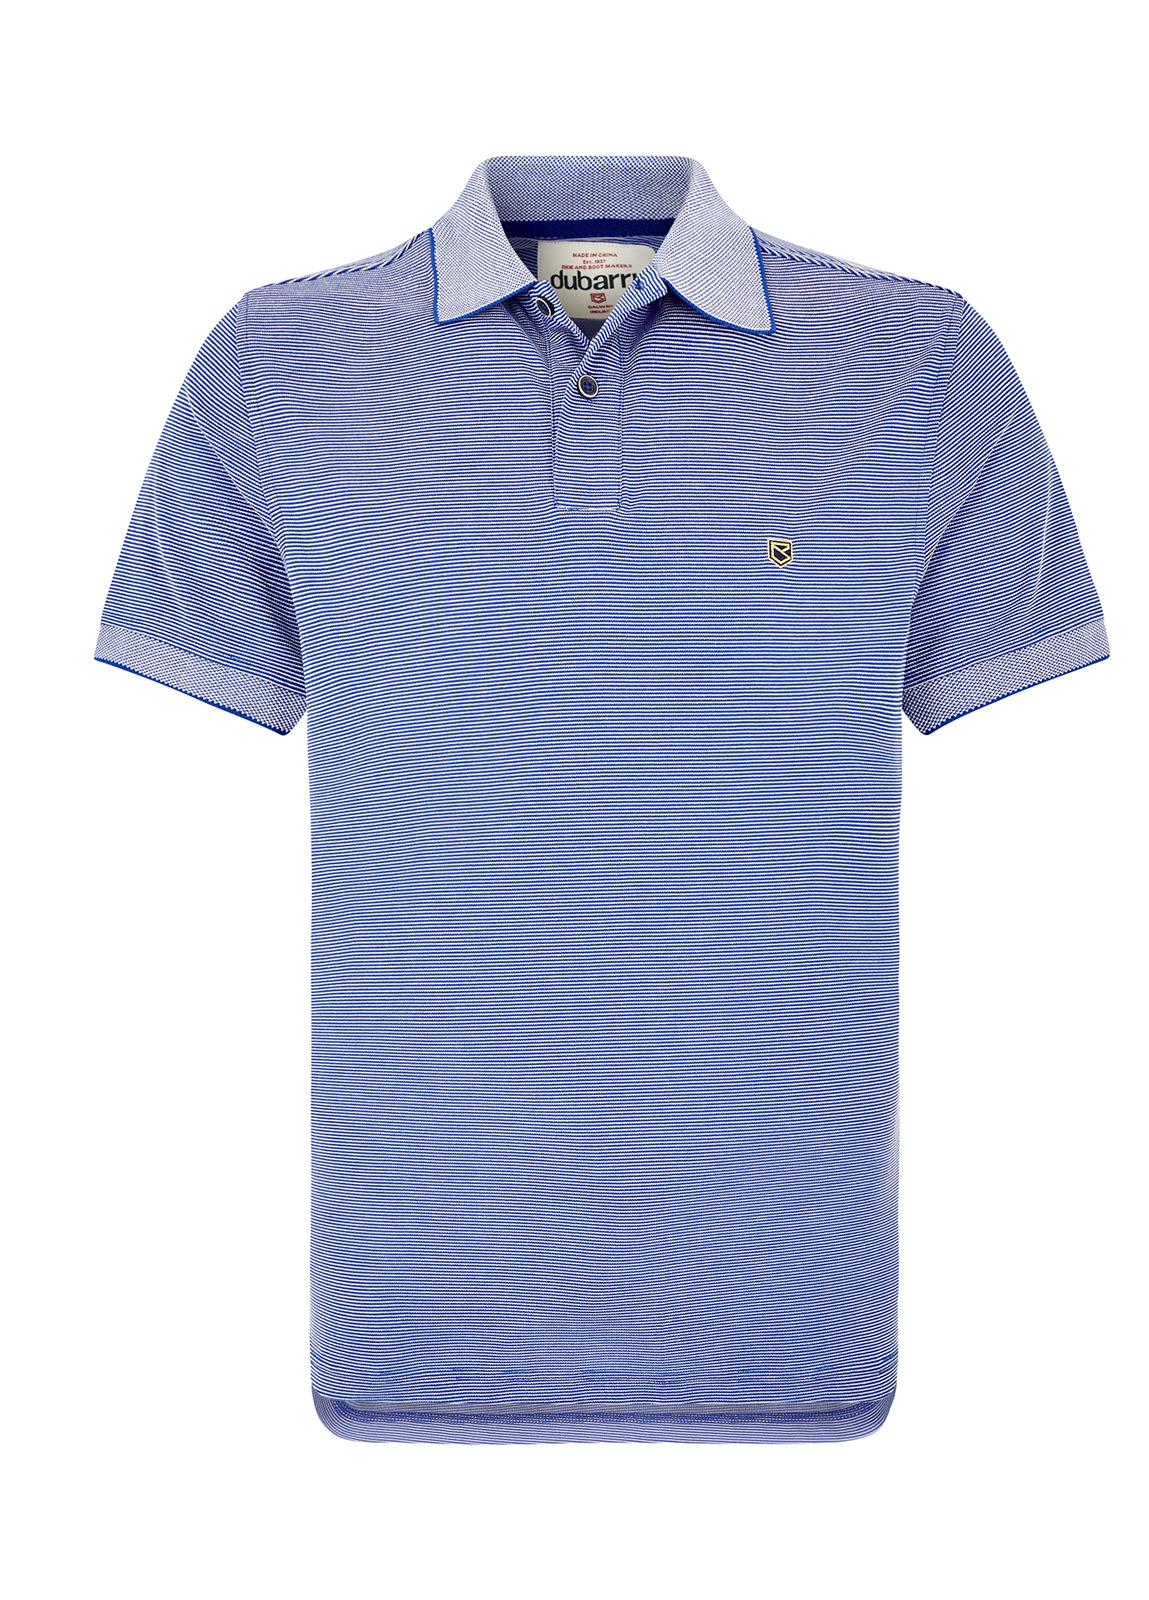 Dubarry_Claremorris Polo Shirt - Royal Blue_Image_2